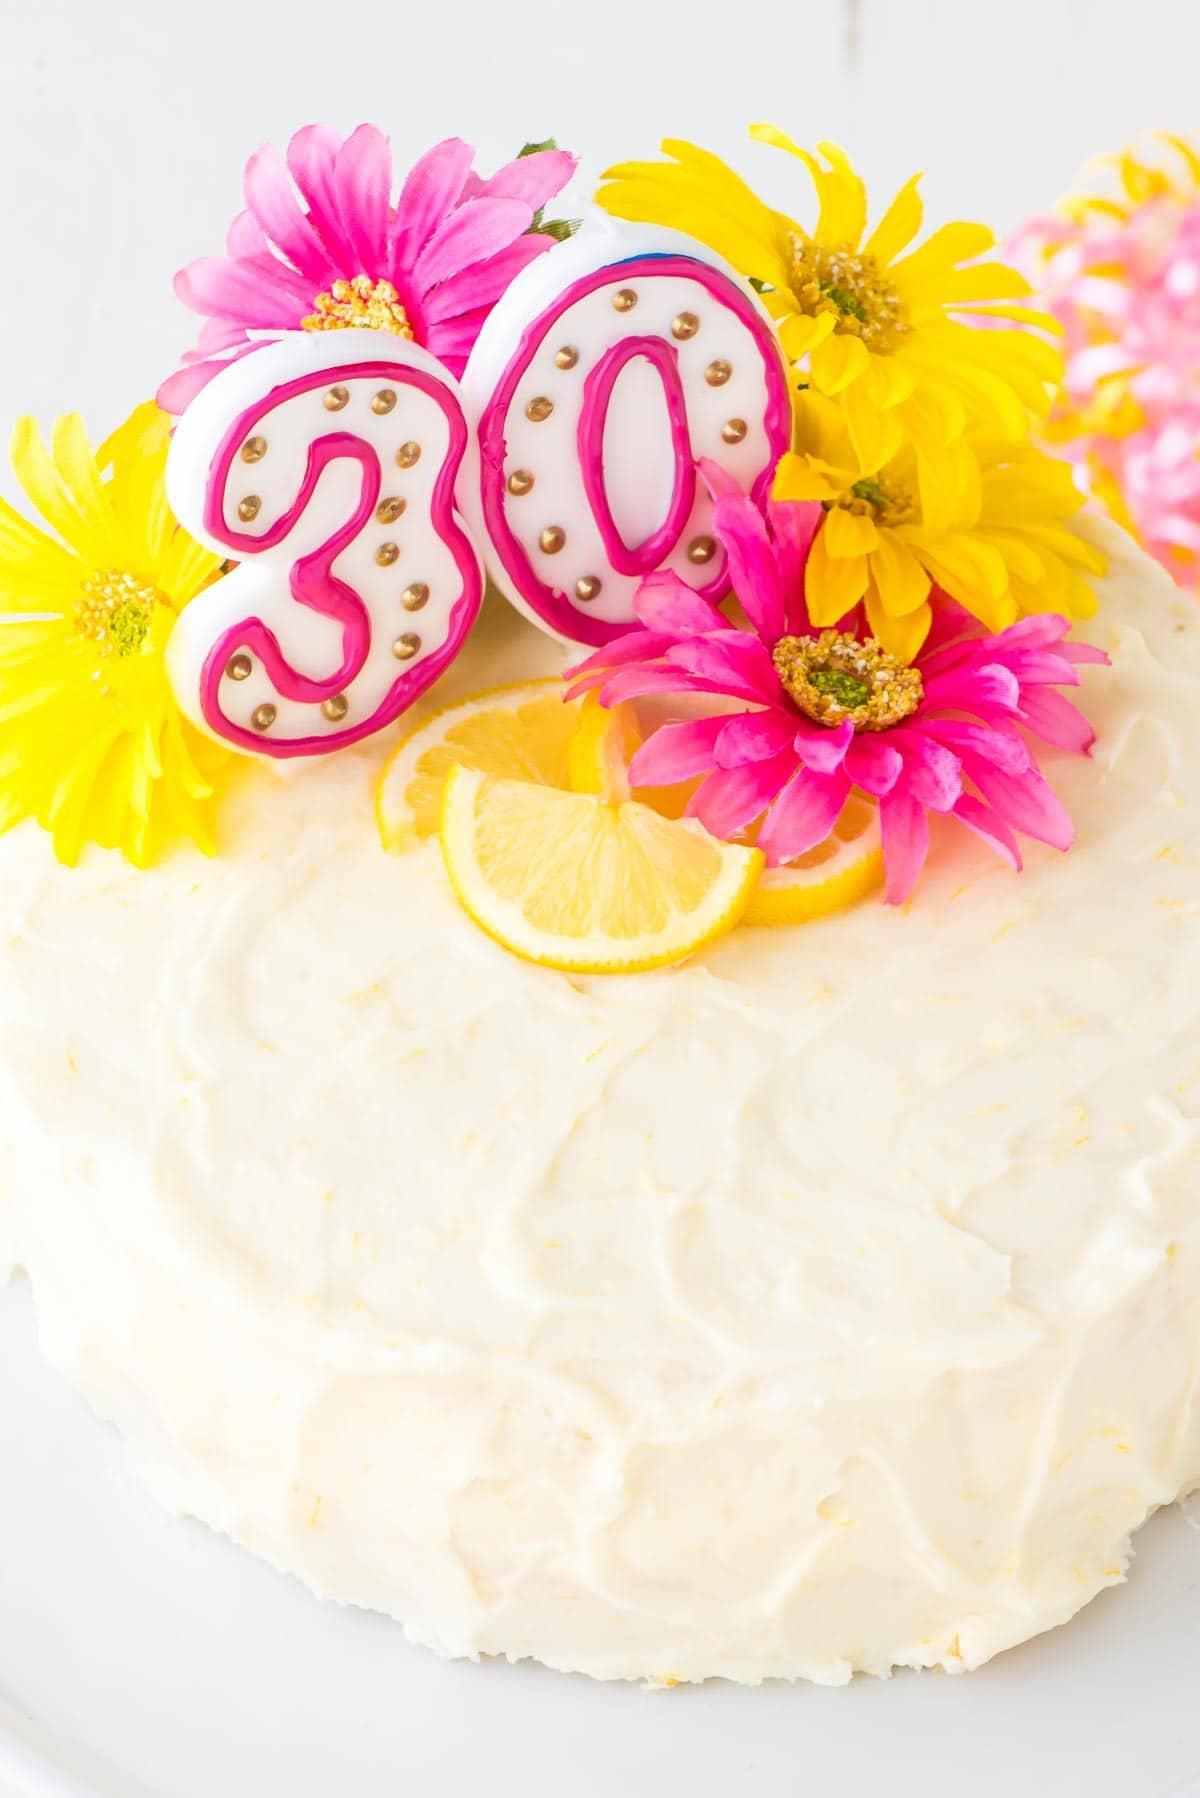 Brilliant Simple Birthday Cake Recipe Lemon Layer Cake With Lemon Cream Personalised Birthday Cards Beptaeletsinfo